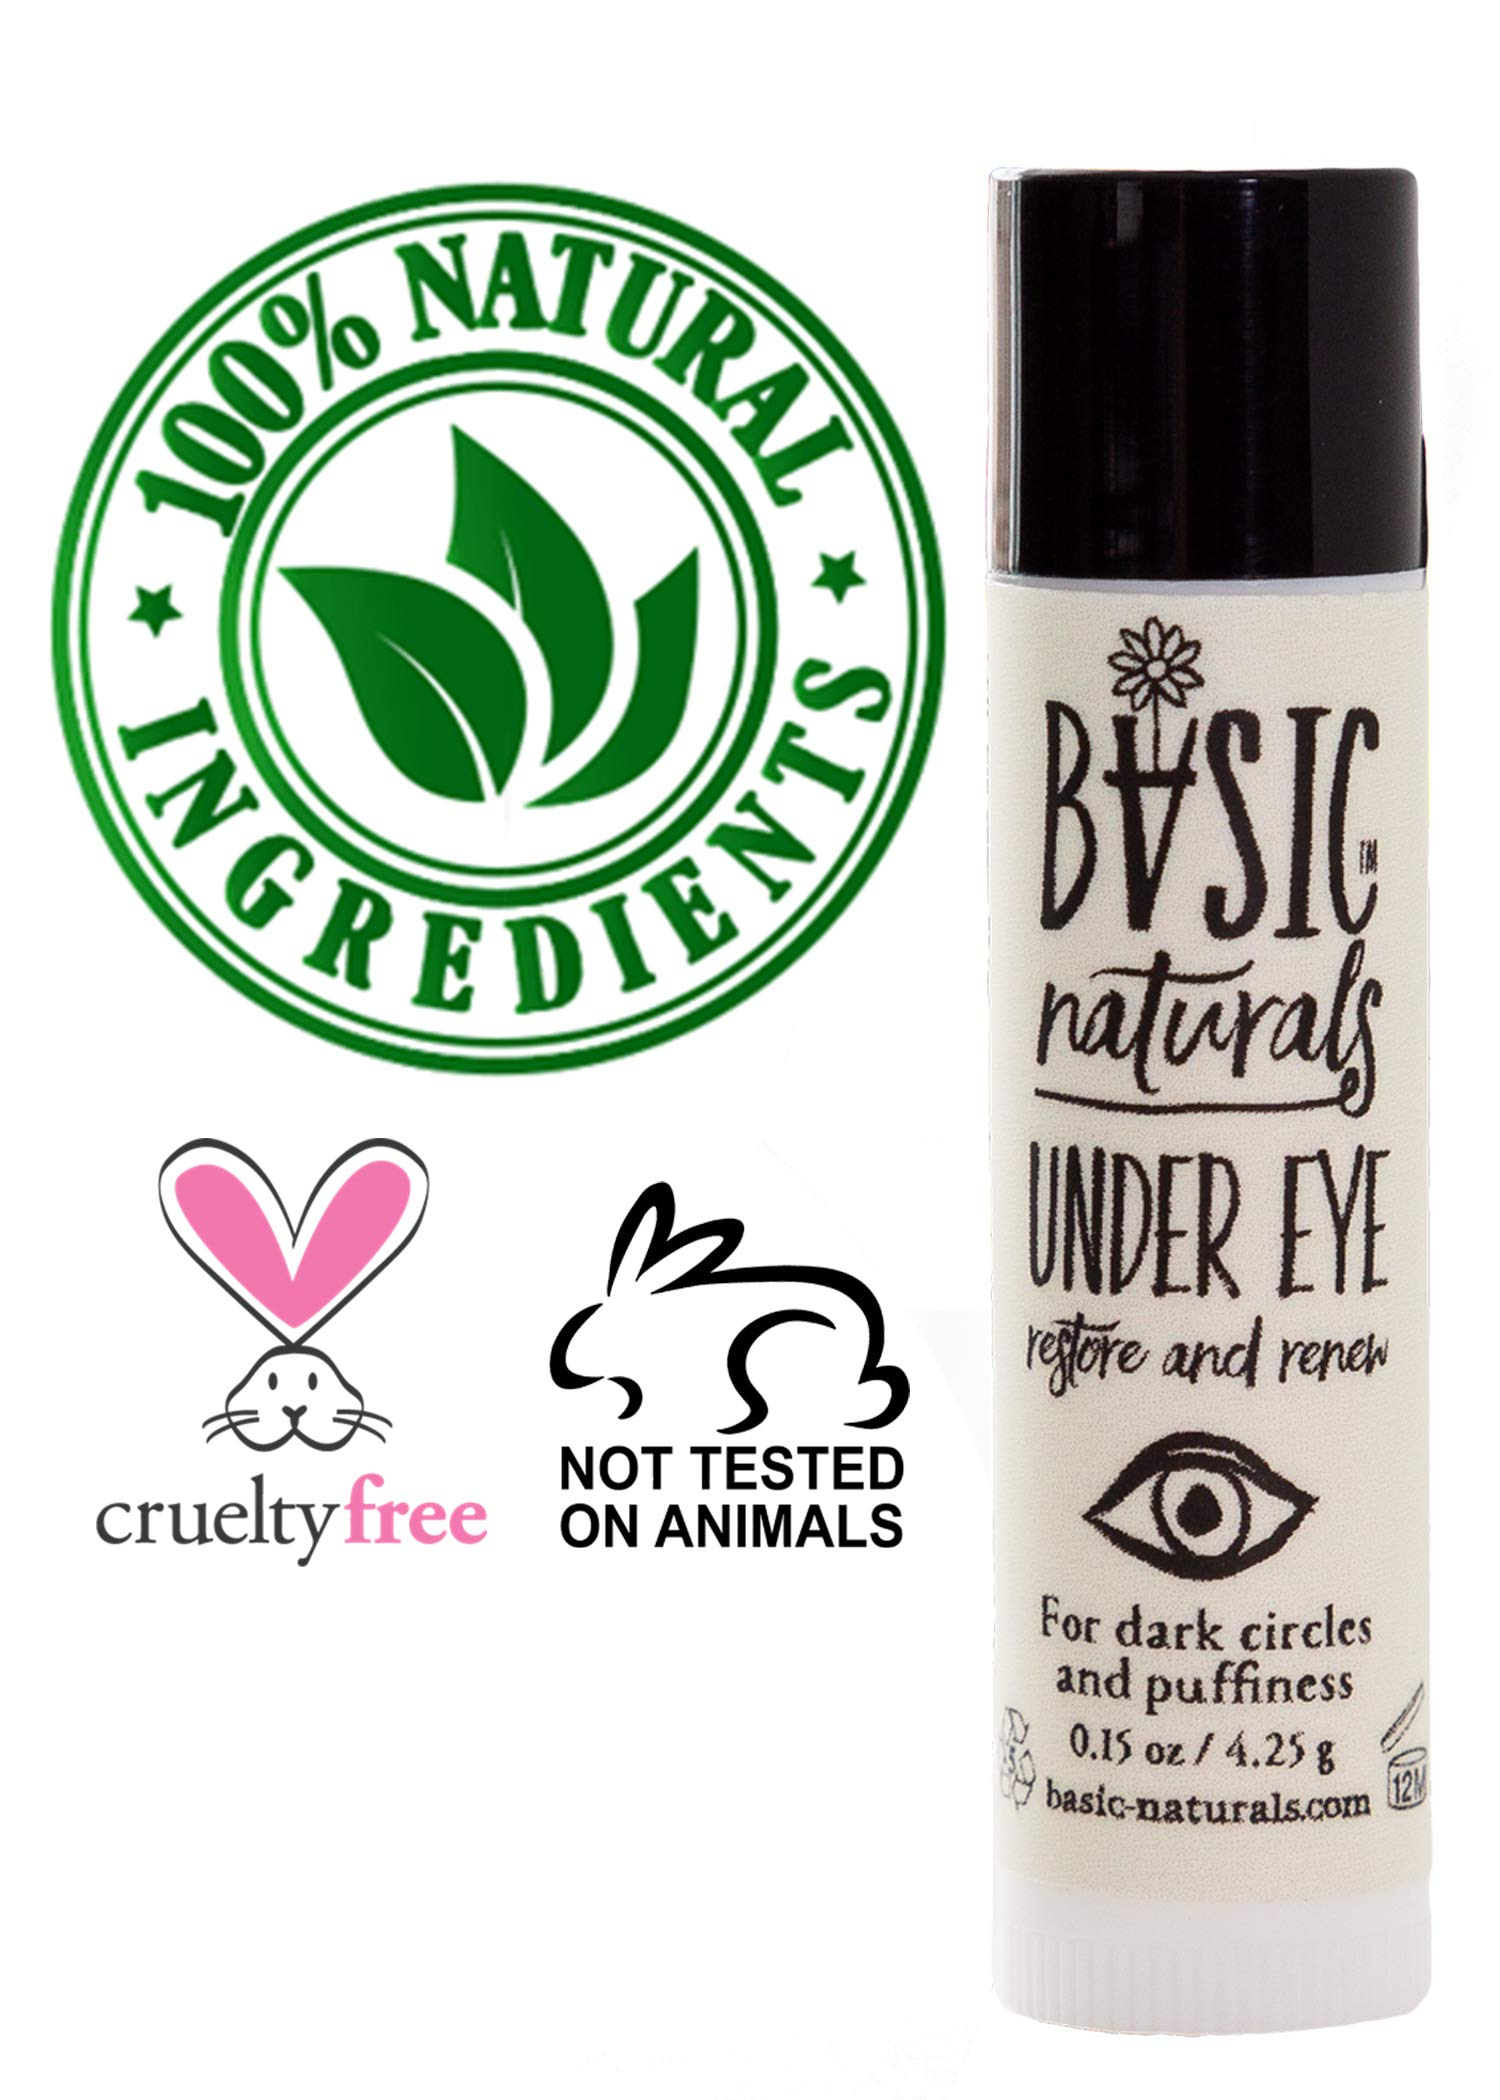 Basic Naturals Organic Daily Eye Serum Reduces Wrinkles, Puffiness, Dark Circles & Under Eye Bags. Organic, Non-GMO (0.35 oz) See Photos